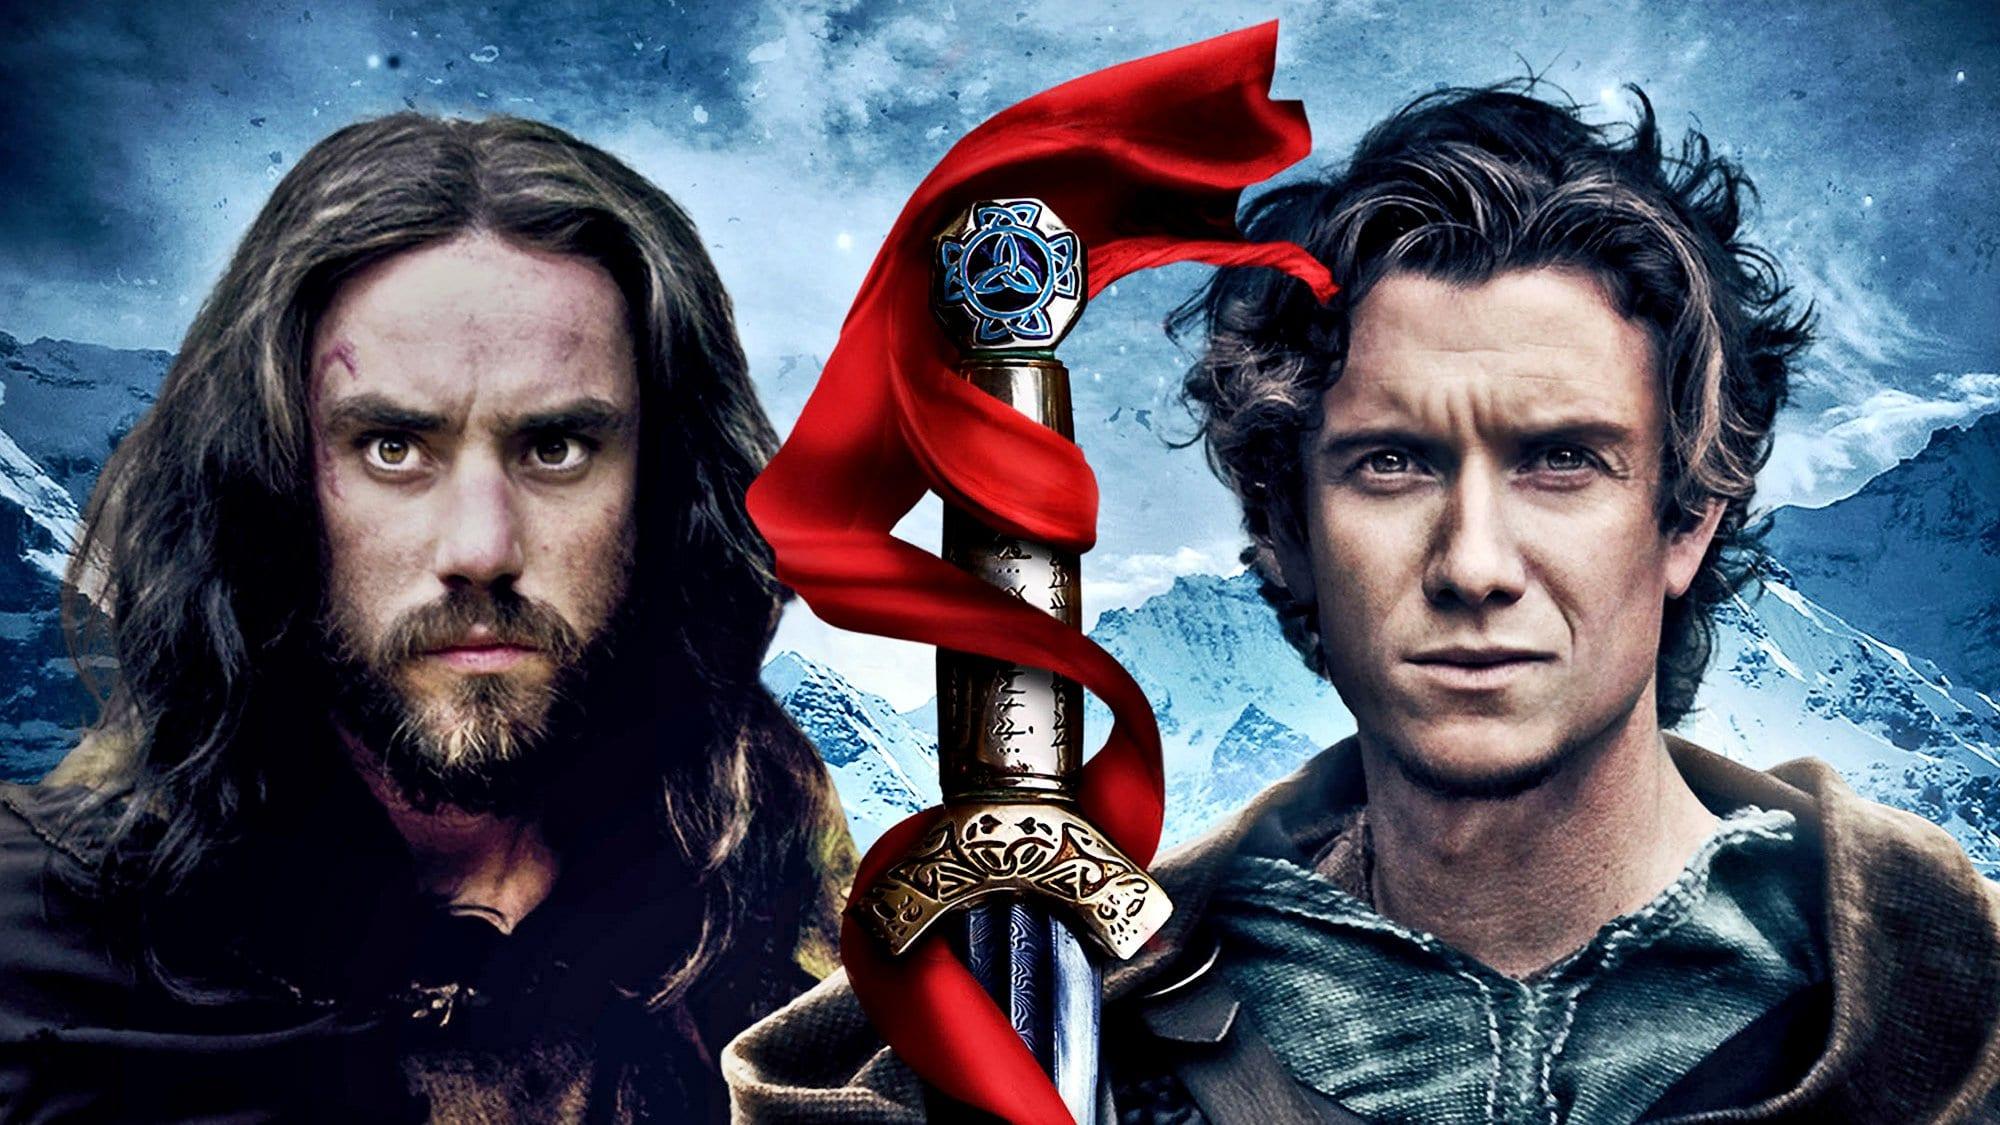 Regarder Arthur et Merlin en streaming gratuit